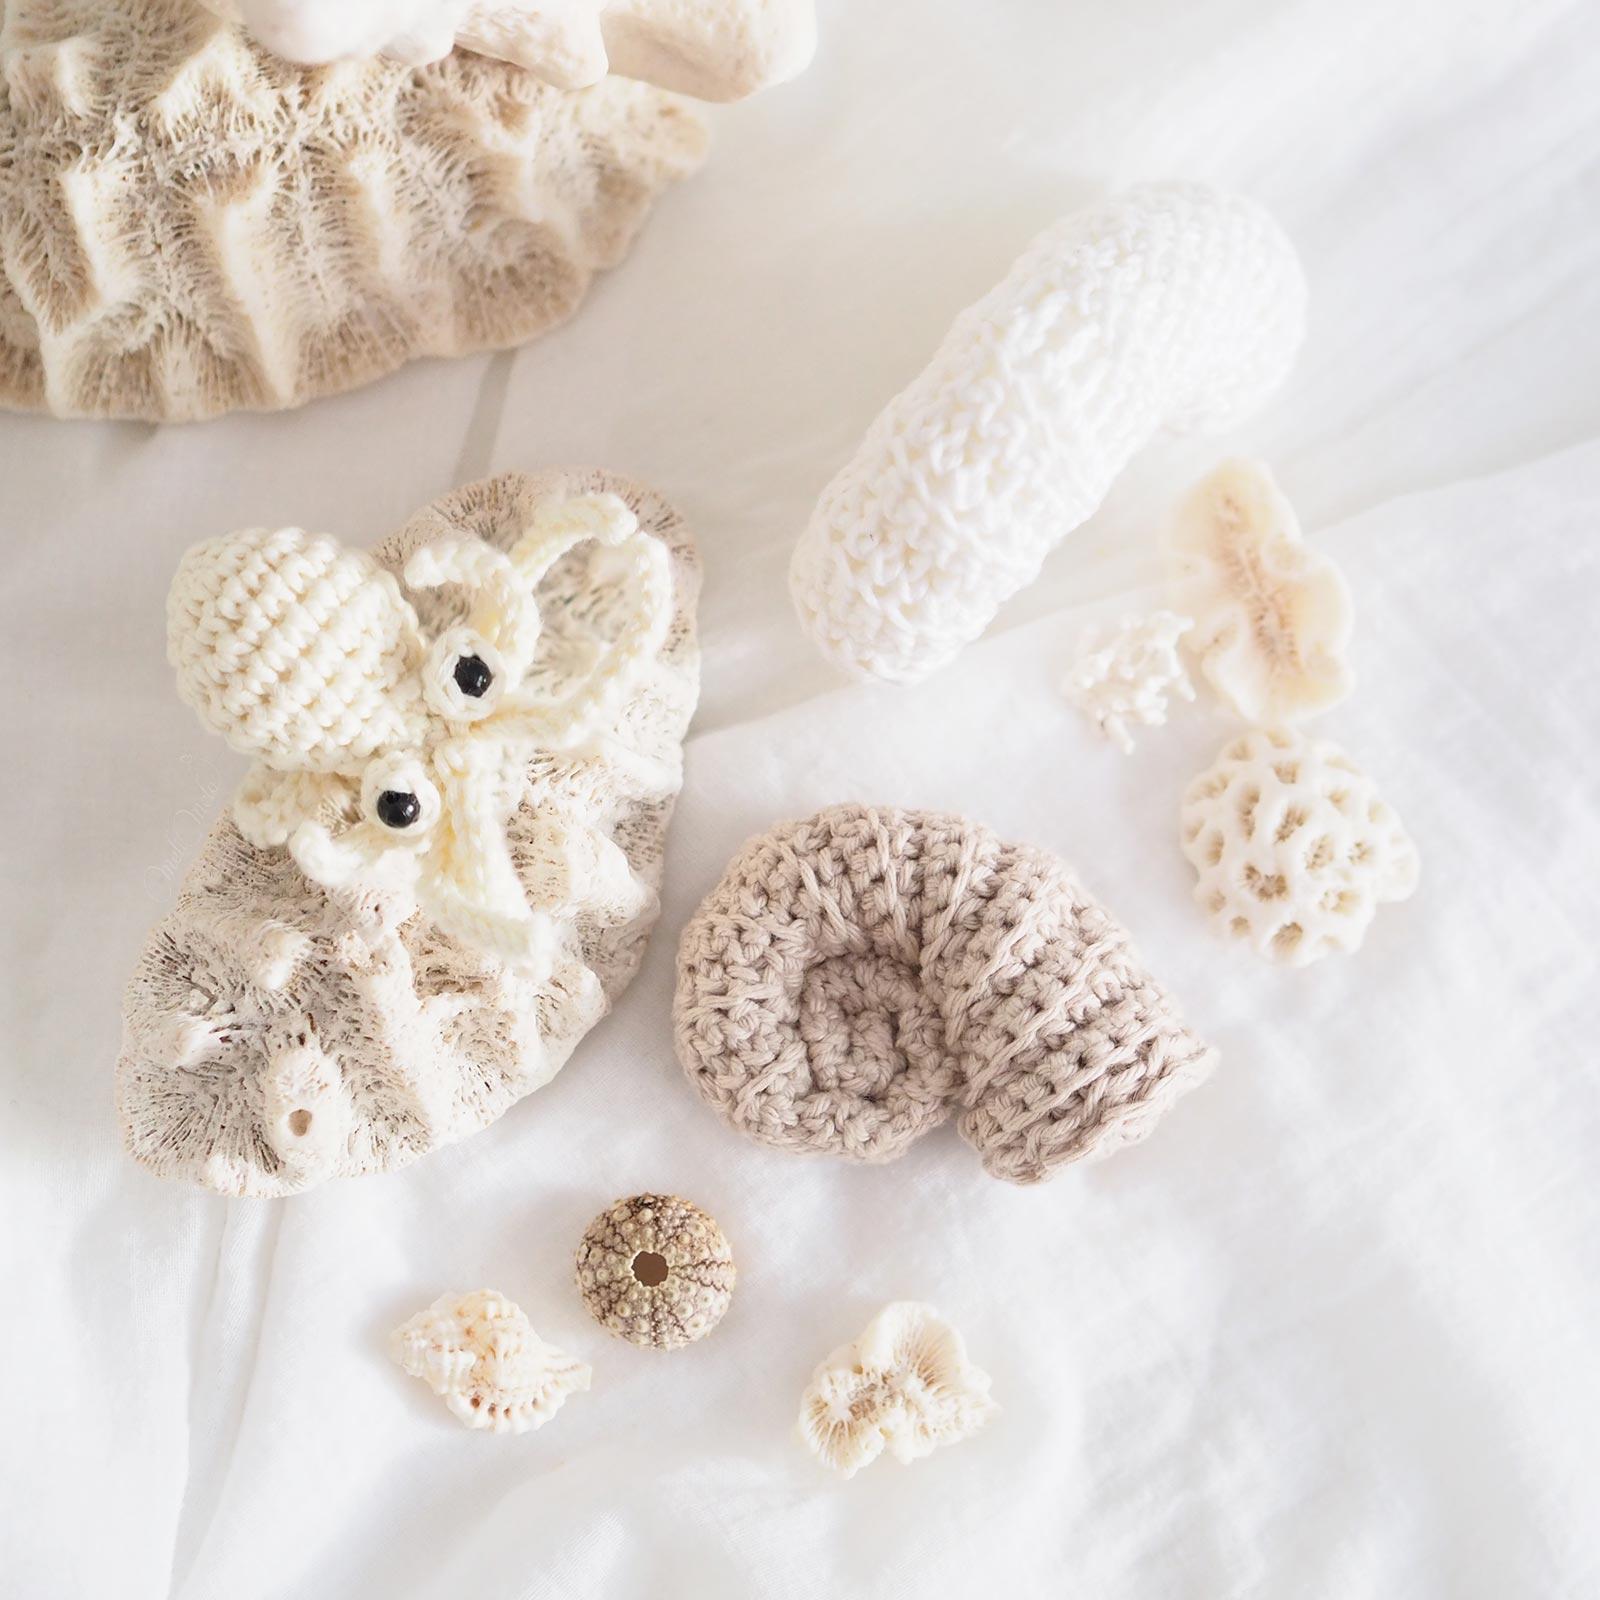 crochet-mini-poulpe-coquillages-nautile-kezakoflo-laboutiquedemelimelo